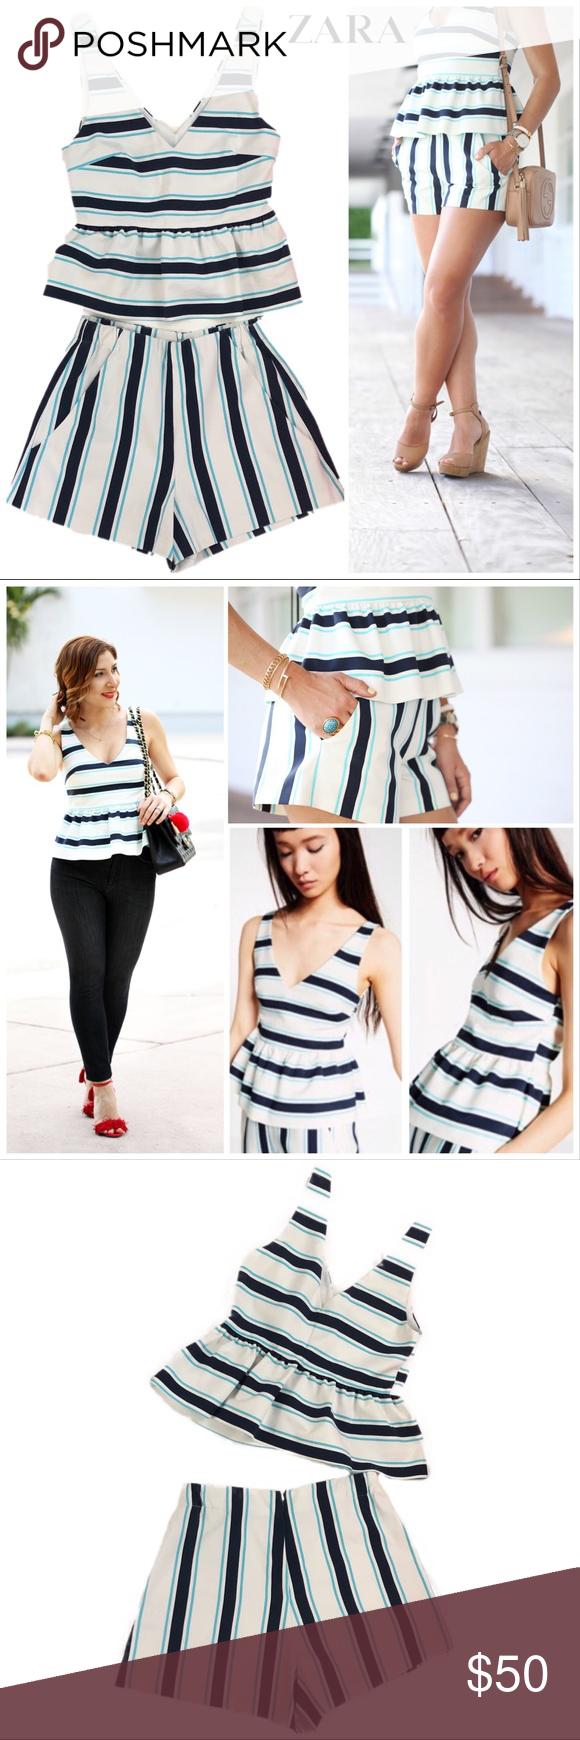 8e7d4e0b16 Zara two piece striped peplum top & shorts set M This adorable Zara striped  two piece peplum top & shorts set is as cute as it is versatile- pair with  ...